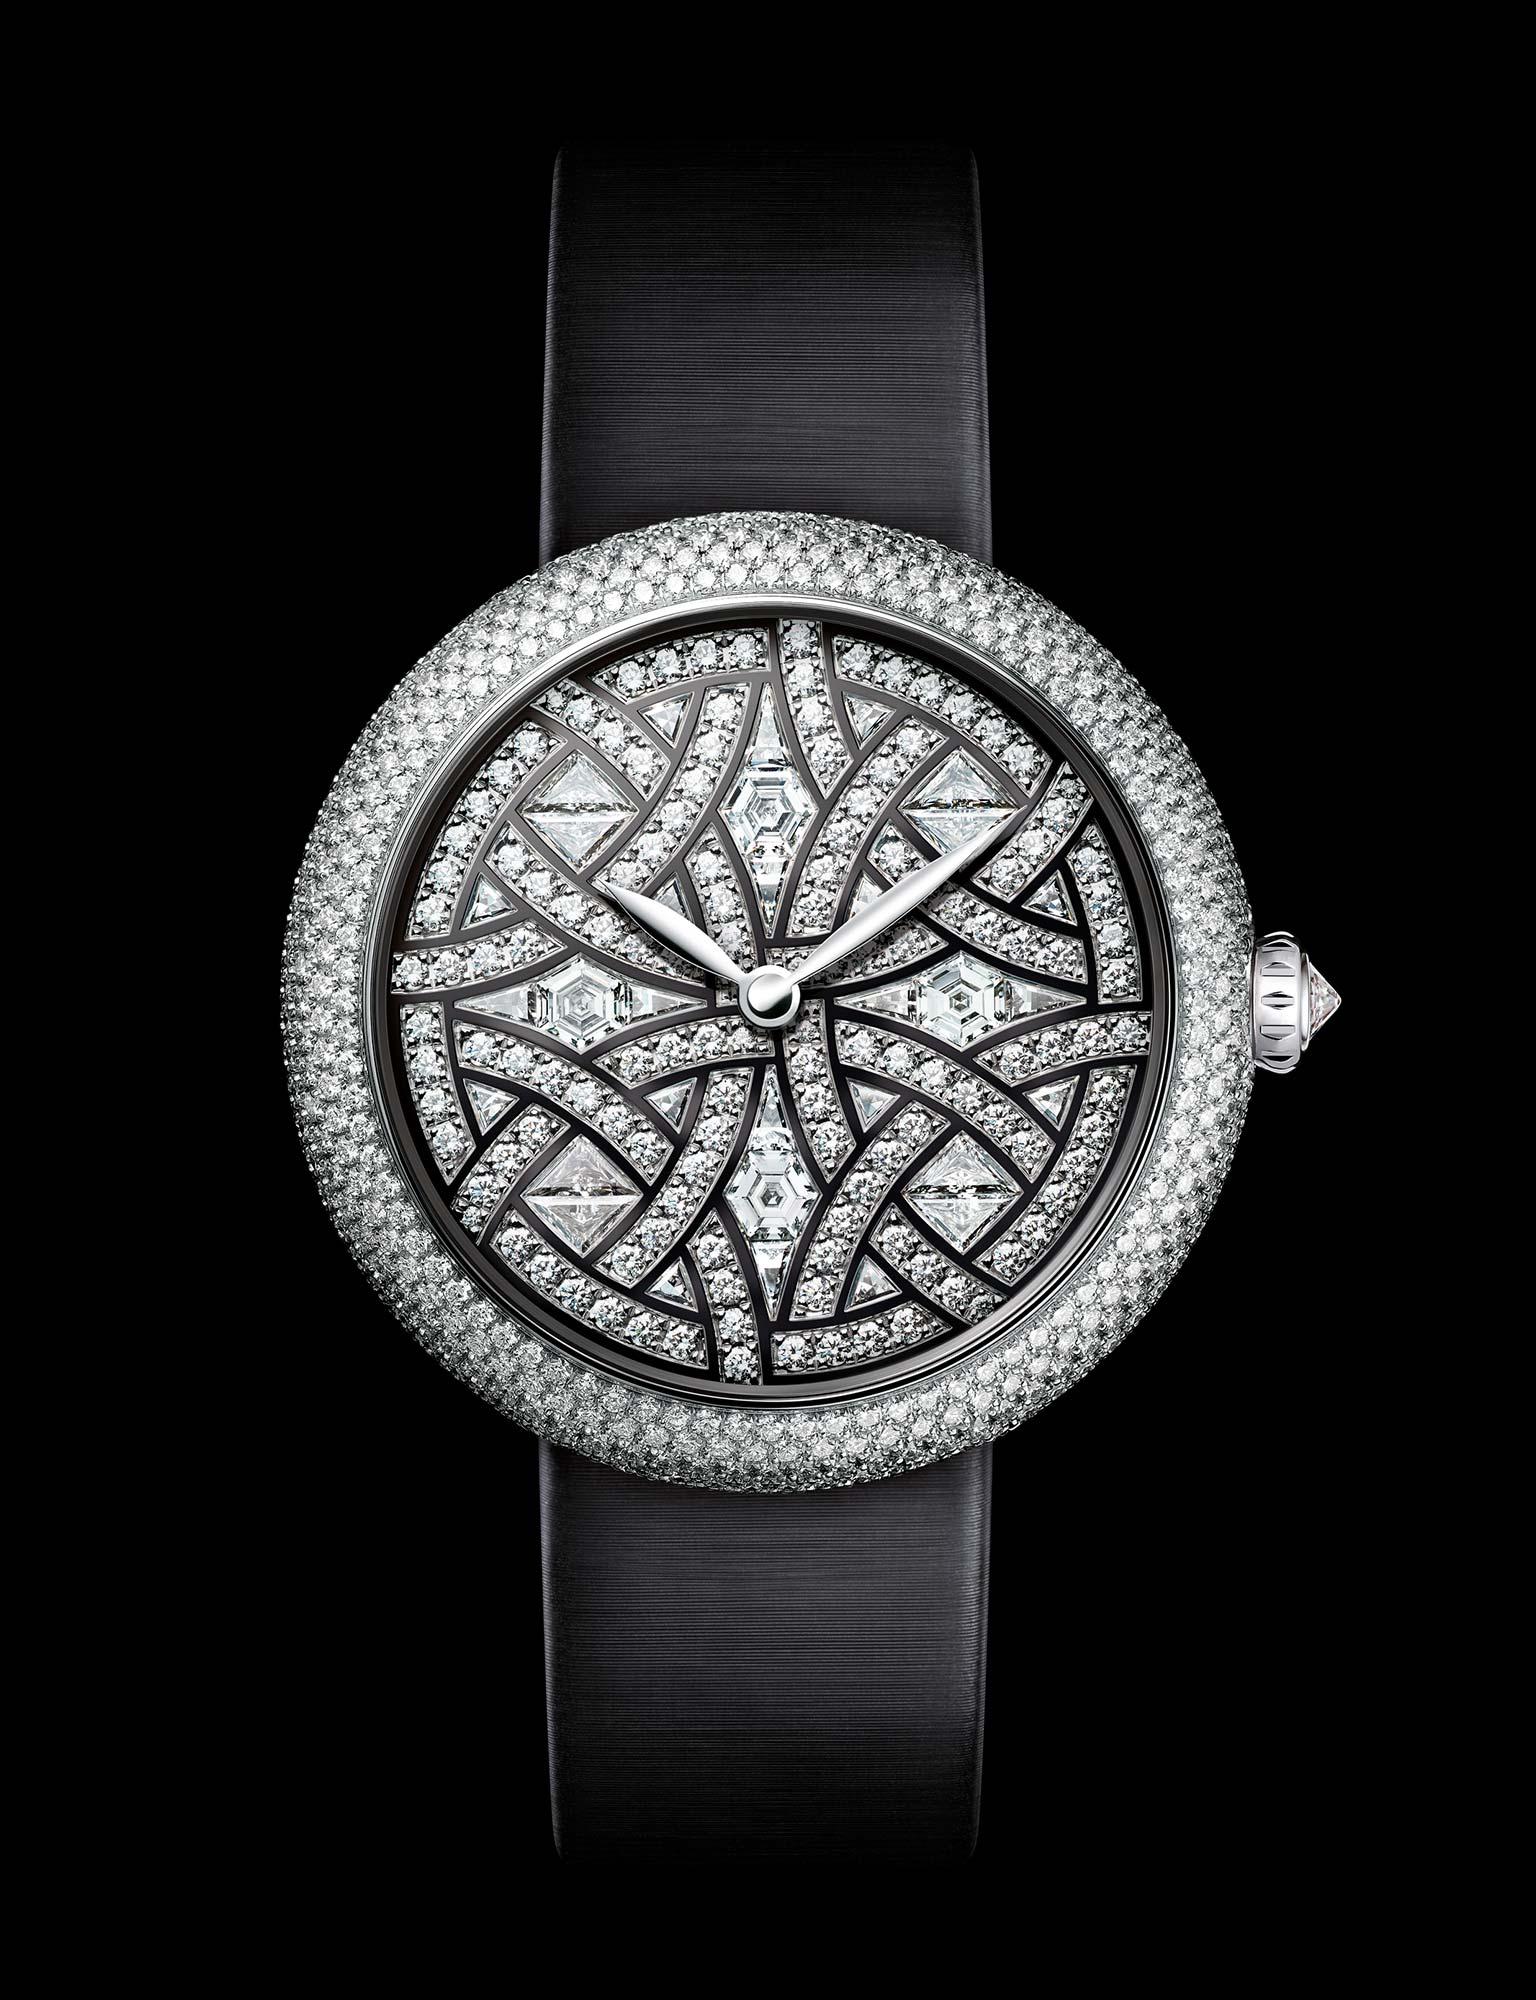 Montre Mademoiselle Prive Chanel Aubazine Baselworld 2017